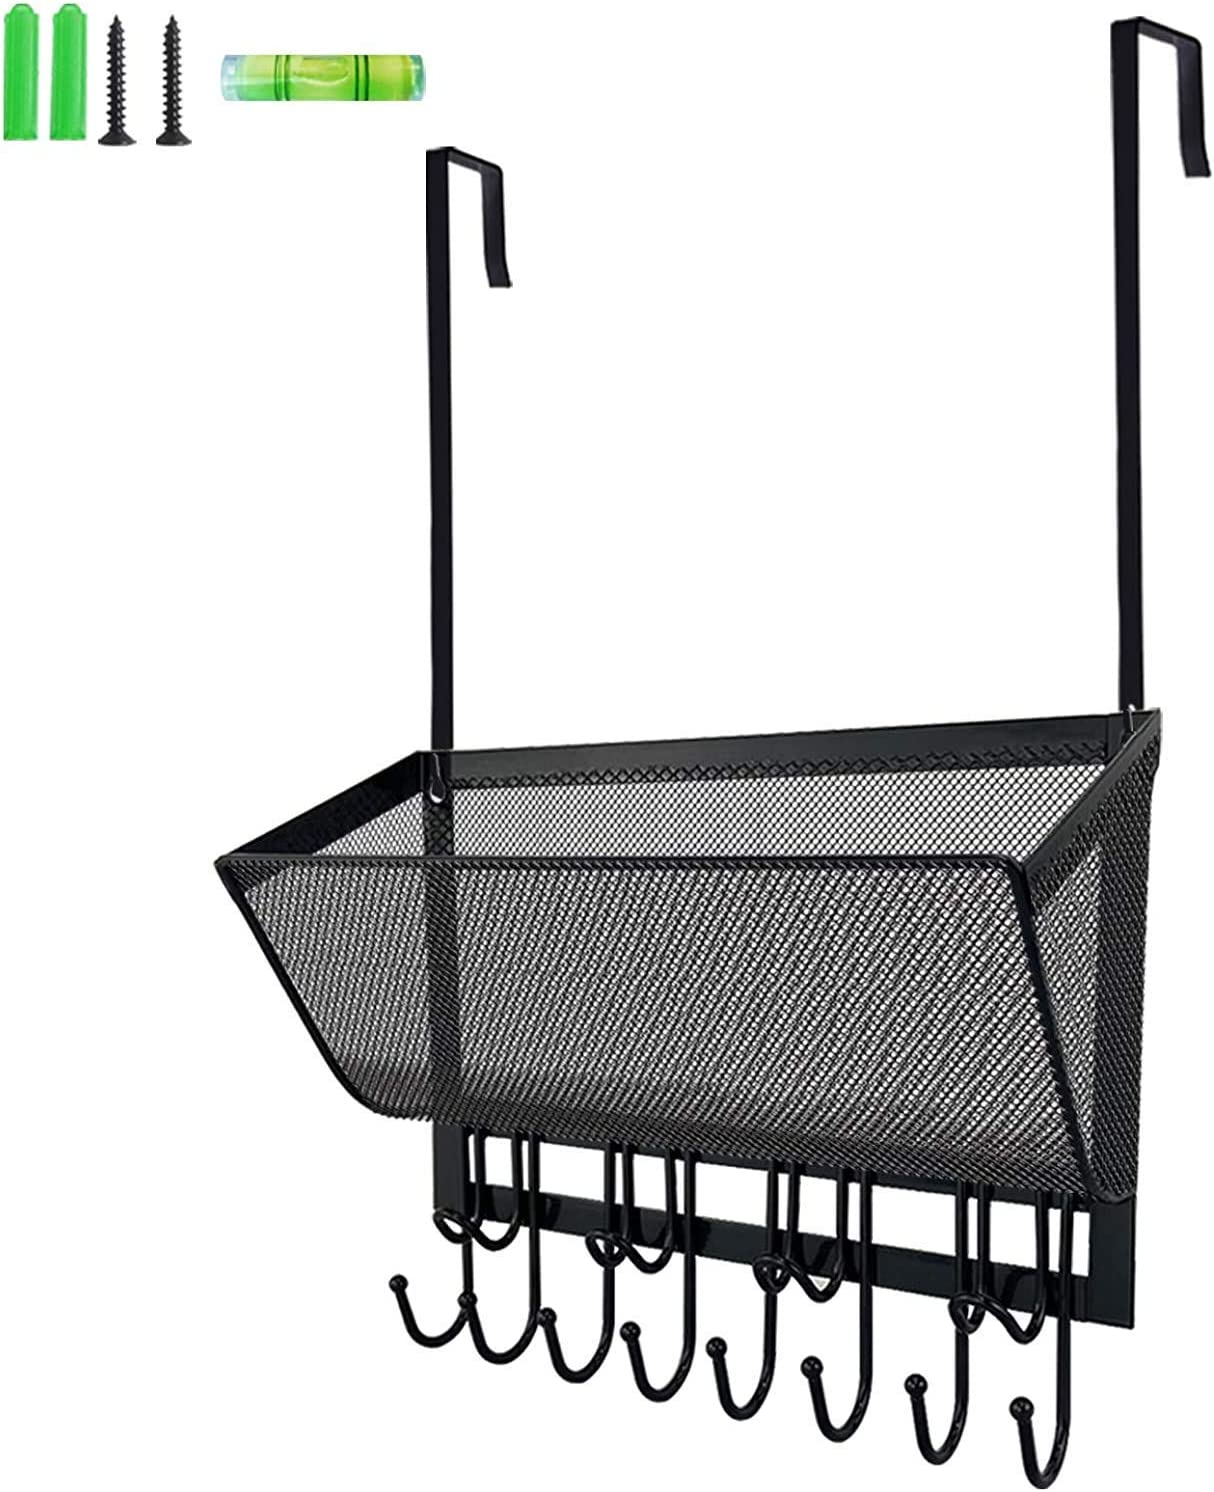 Giftgarden 3pcs Floating Shelves Bundle with Over The Door Hooks Coat Rack with Wire Mesh Basket